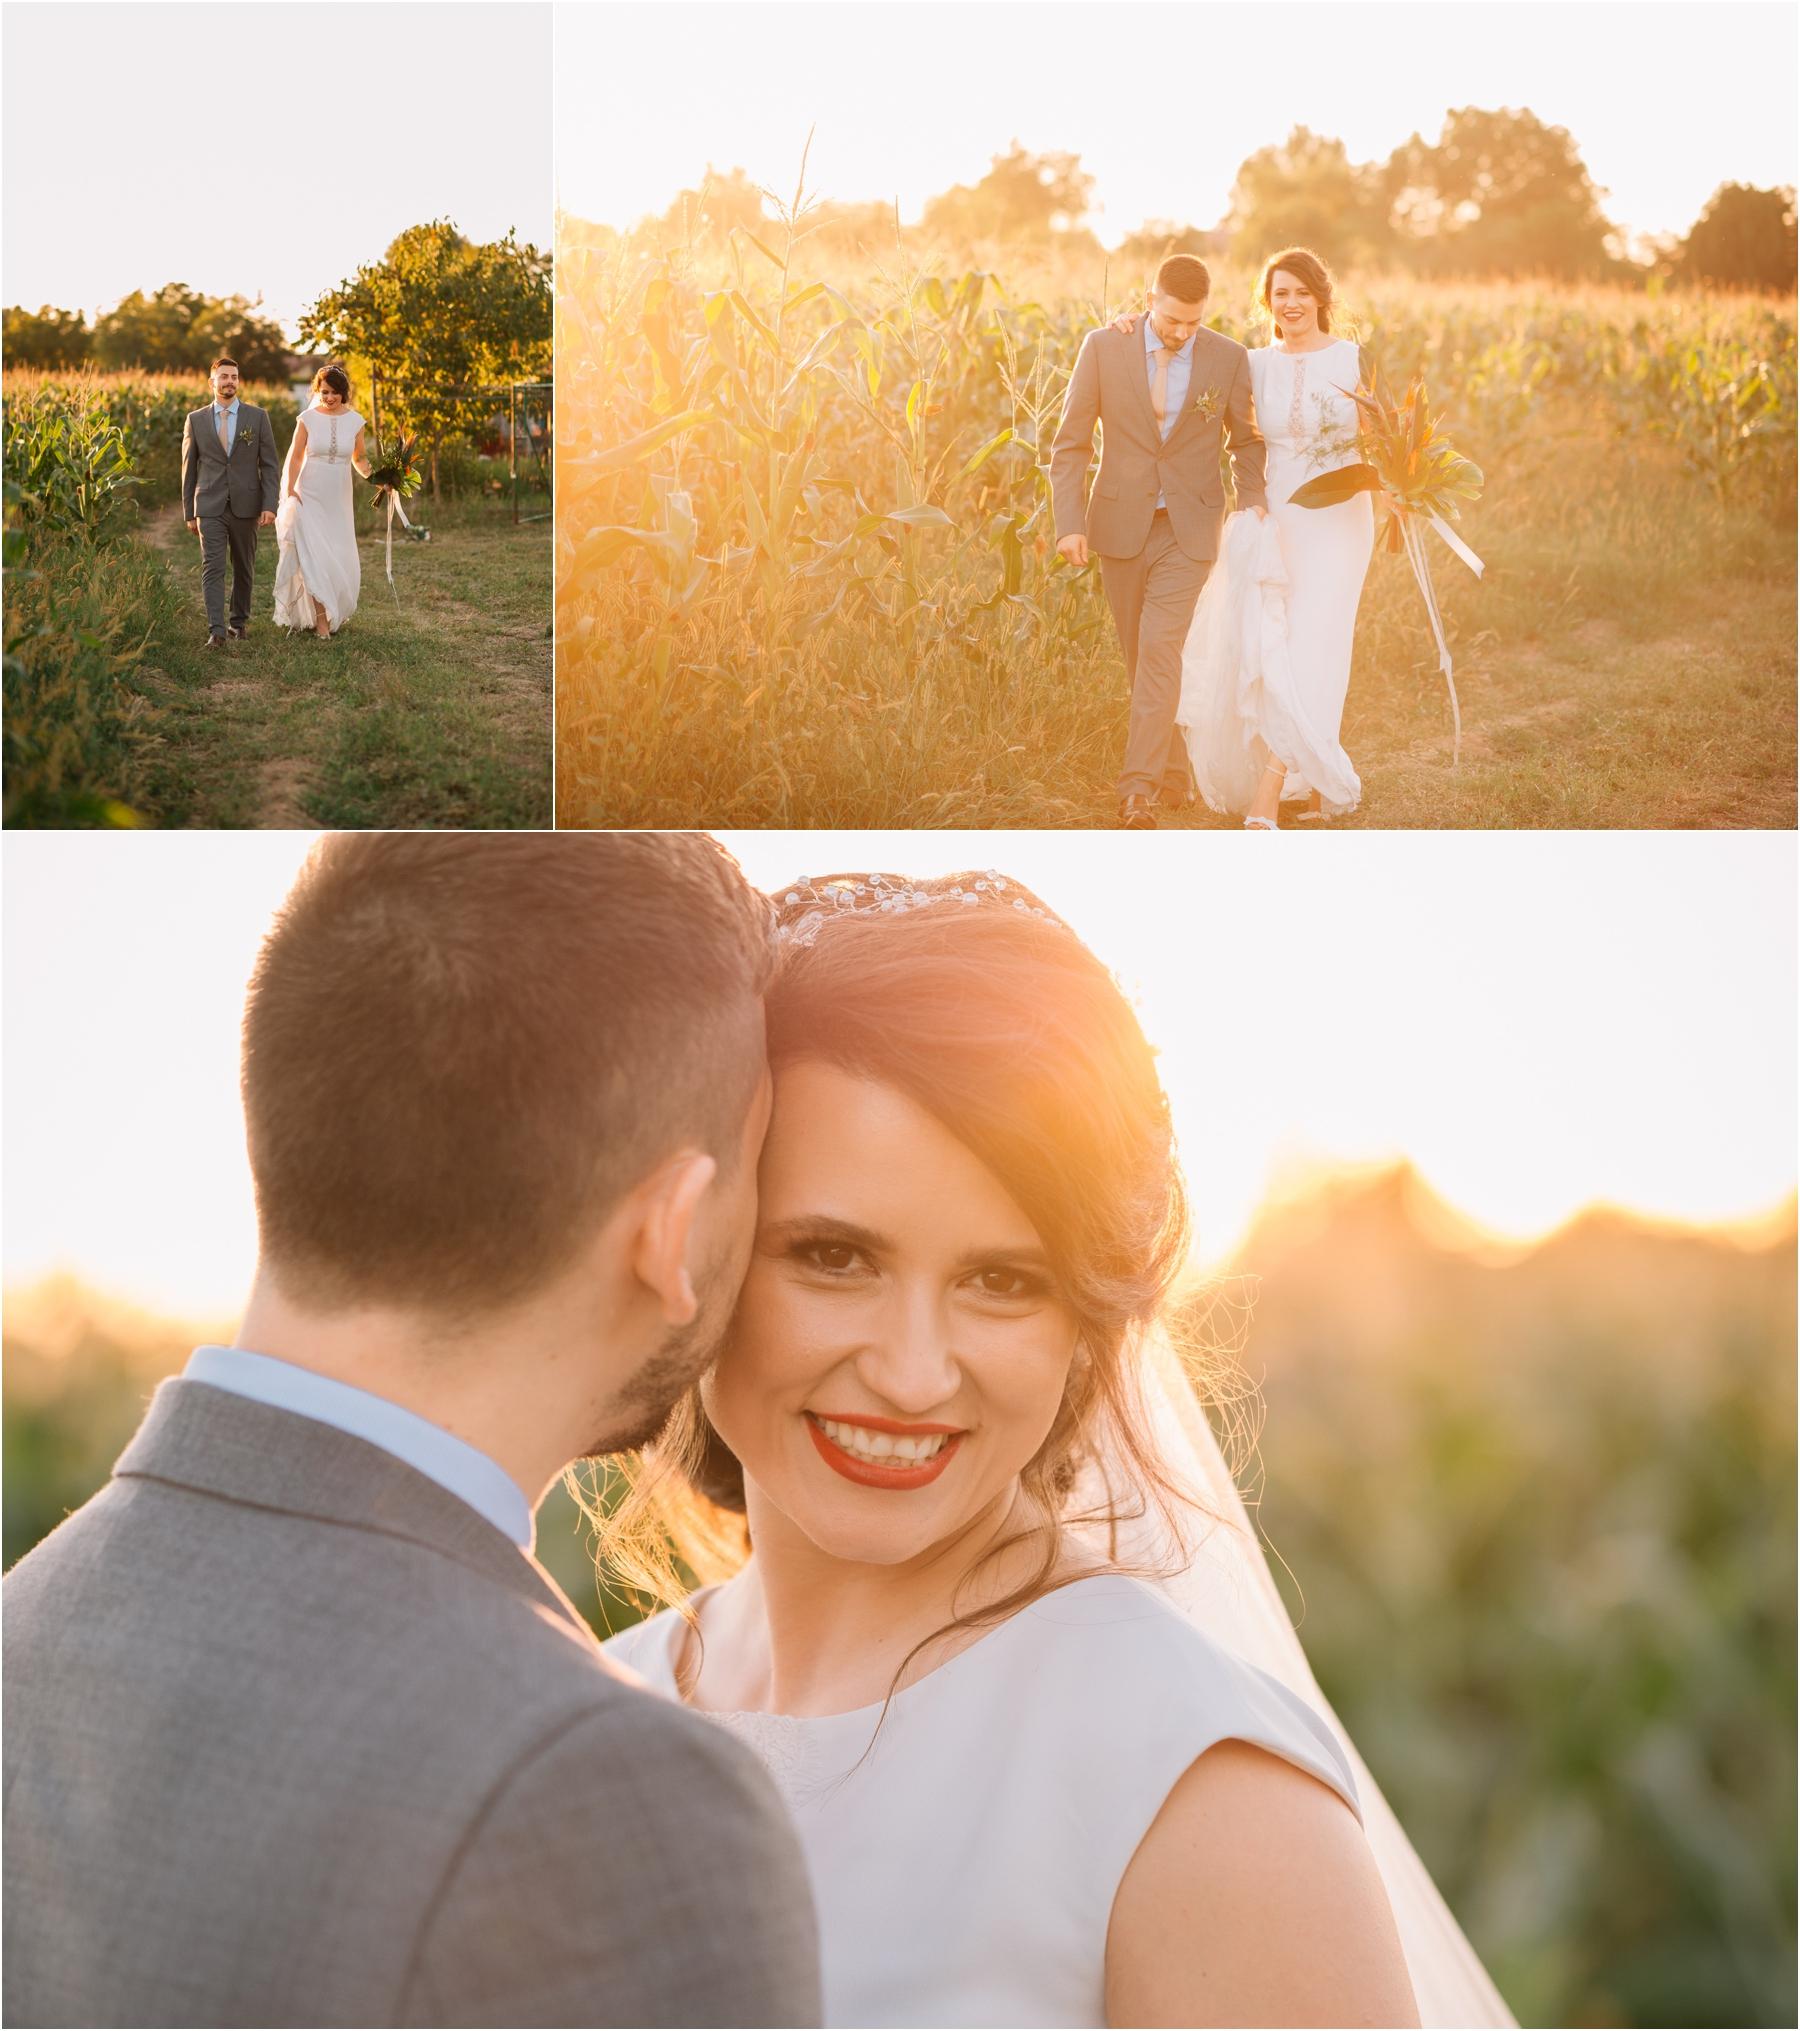 wedding deersphotography0039